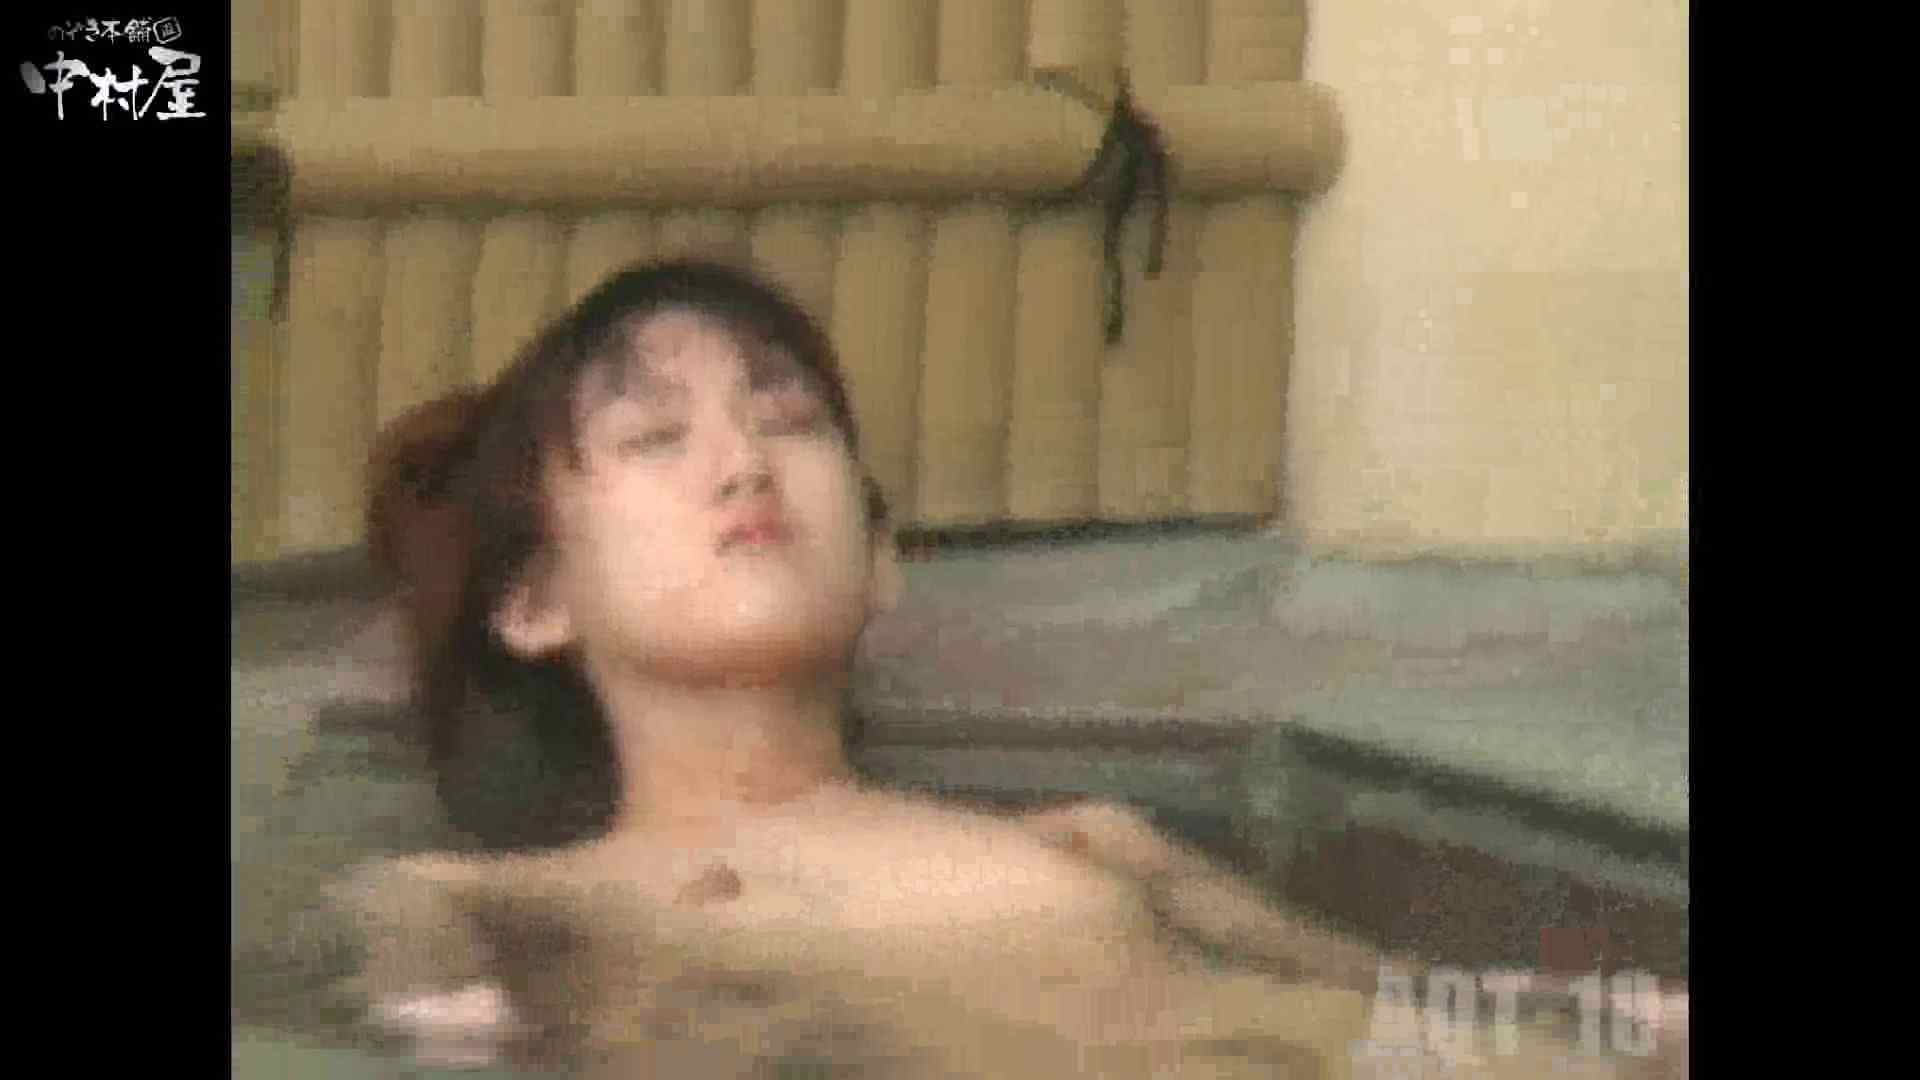 Aquaな露天風呂Vol.882潜入盗撮露天風呂十八判湯 其の七 潜入   OLセックス  84画像 57